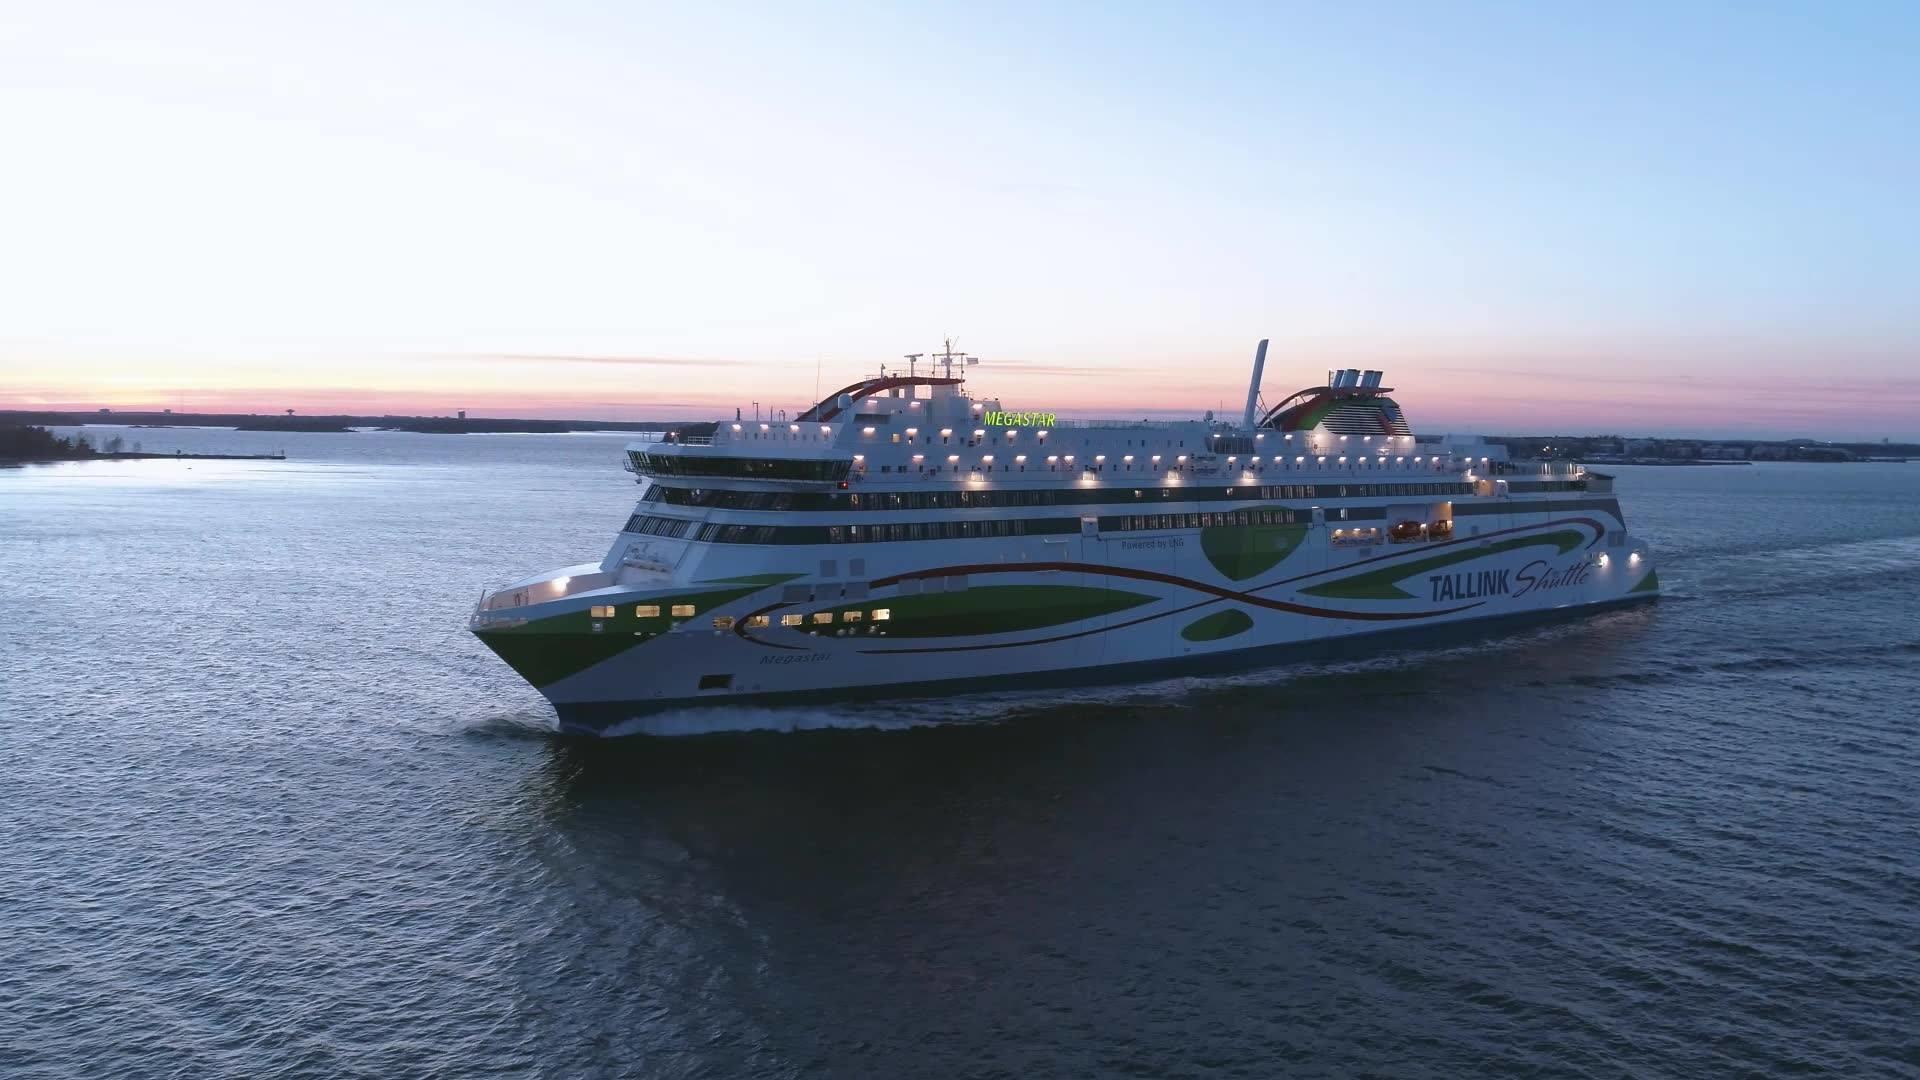 "<p>Фото © Facebook / <a href=""https://www.facebook.com/TallinkSiljaInternational/?tn-str=k%2AF"" target=""_self"">Tallink Silja International</a></p>"